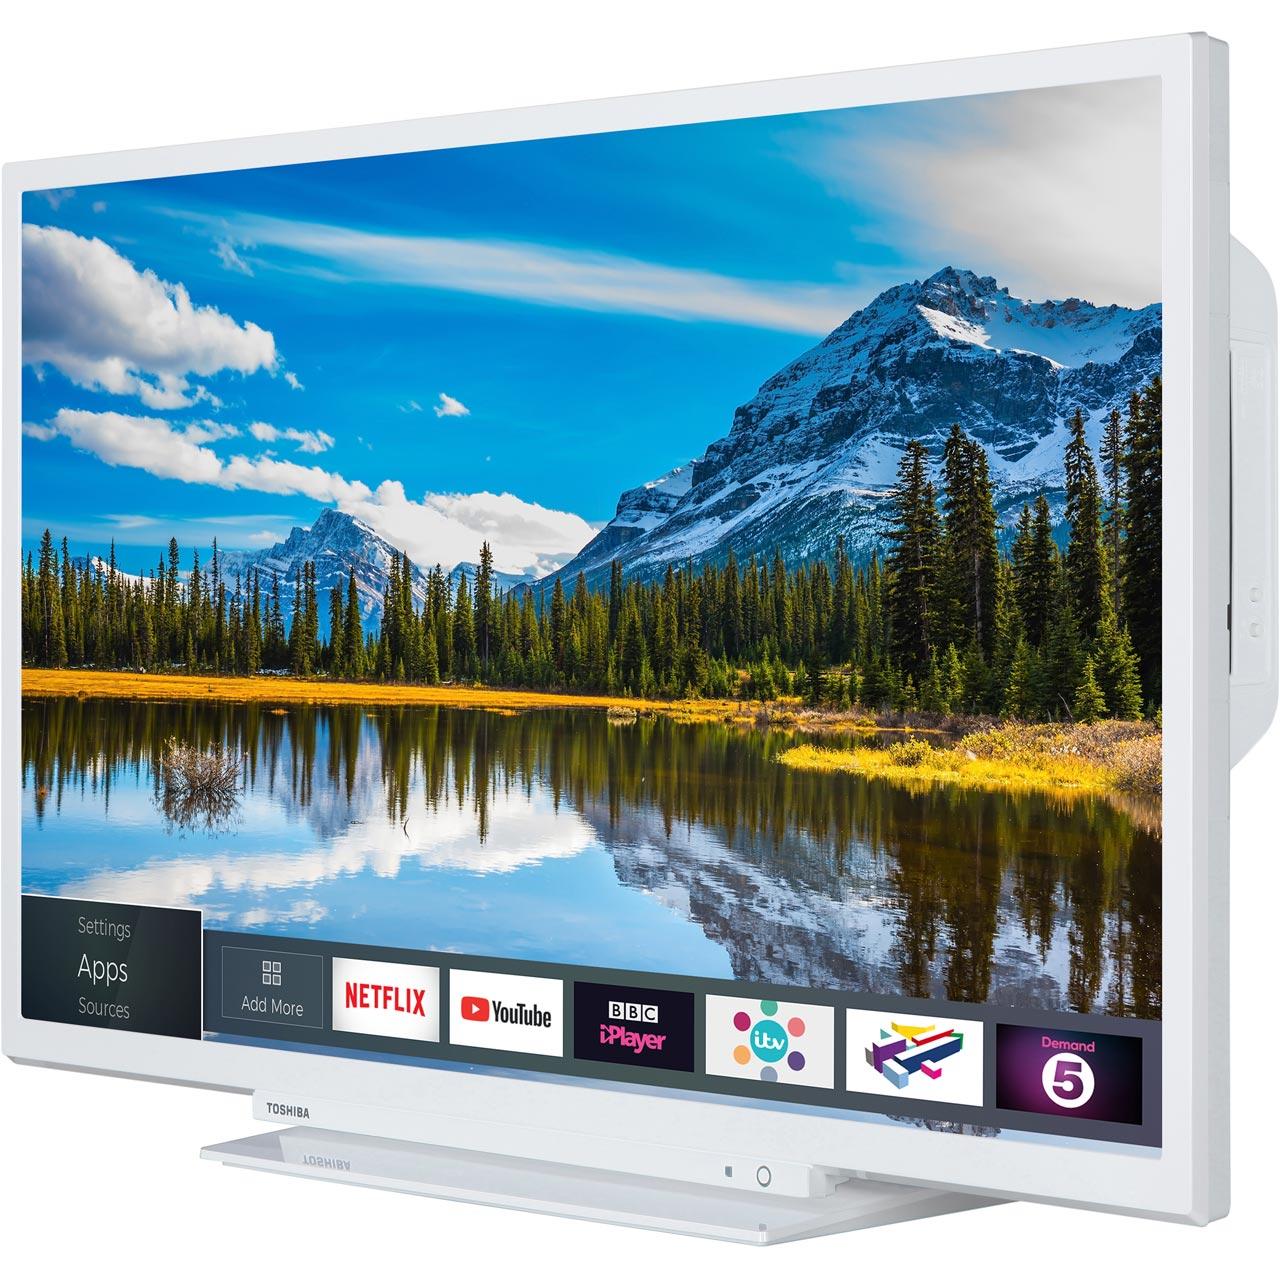 Toshiba 32d3864db 32 Inch 720p Hd Ready A Smart Led Tv Dvd Combi Washing Machine Wiring Diagram 199